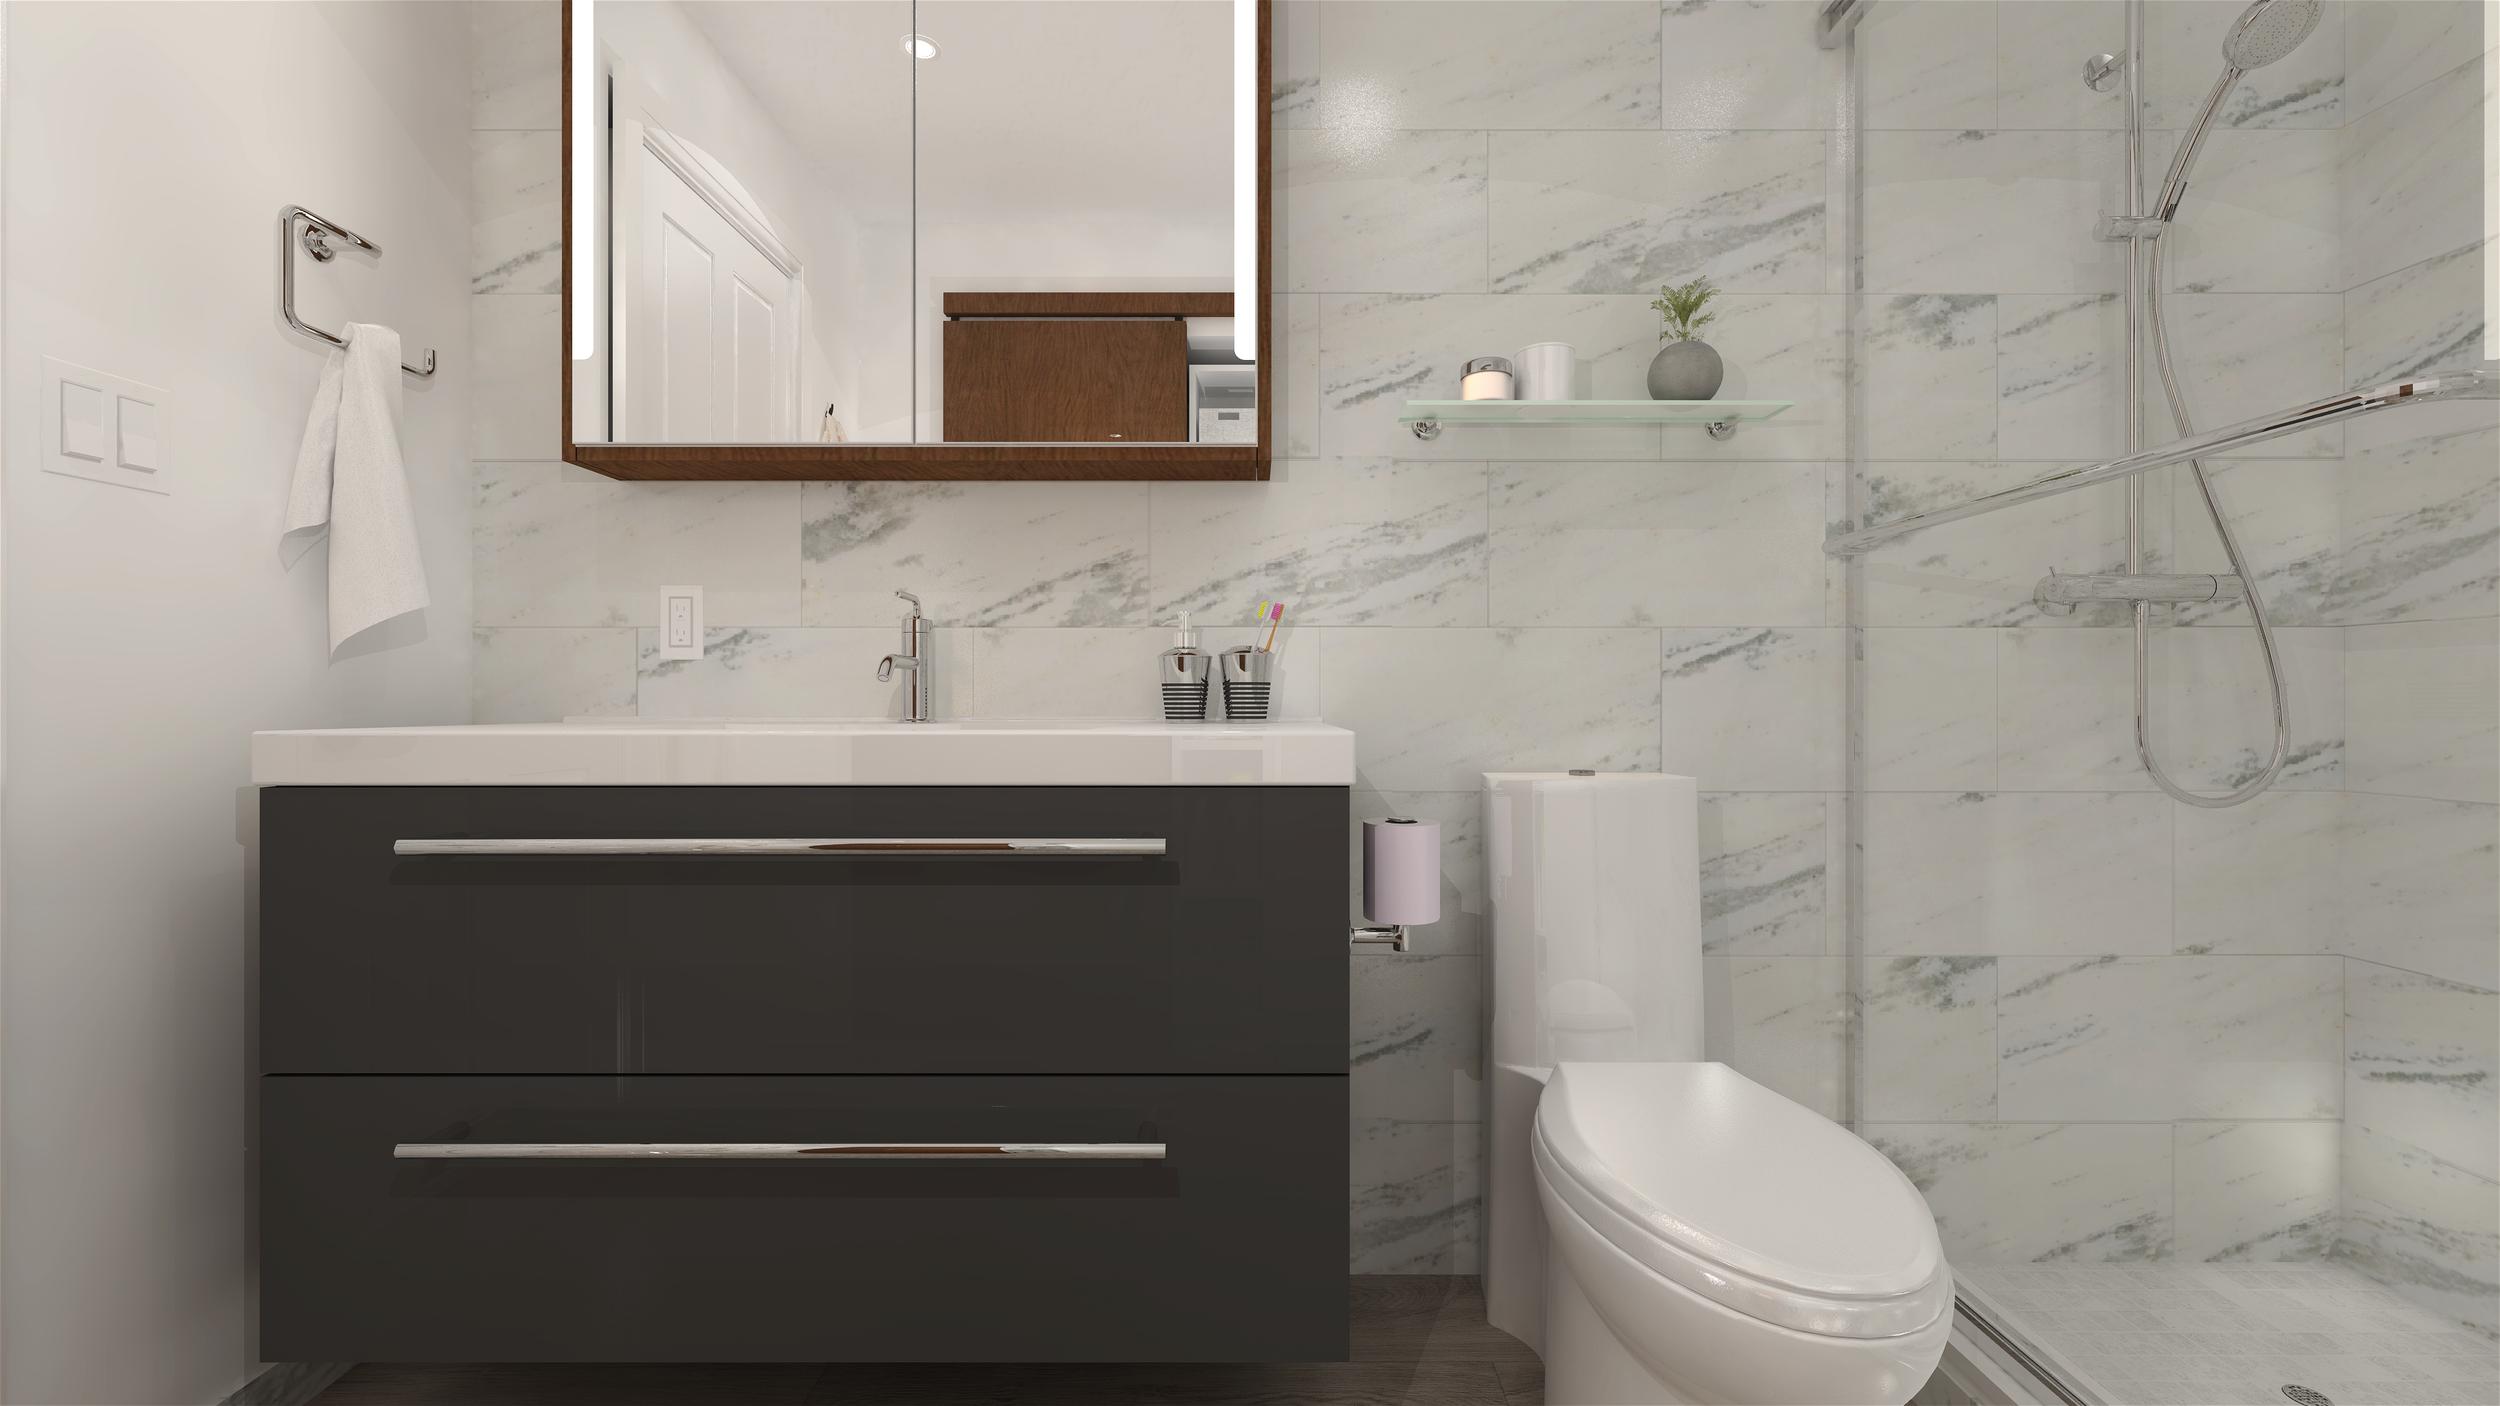 deSousaDESIGN_Bathroom_Small_Lux_V1b_3840_2160.png